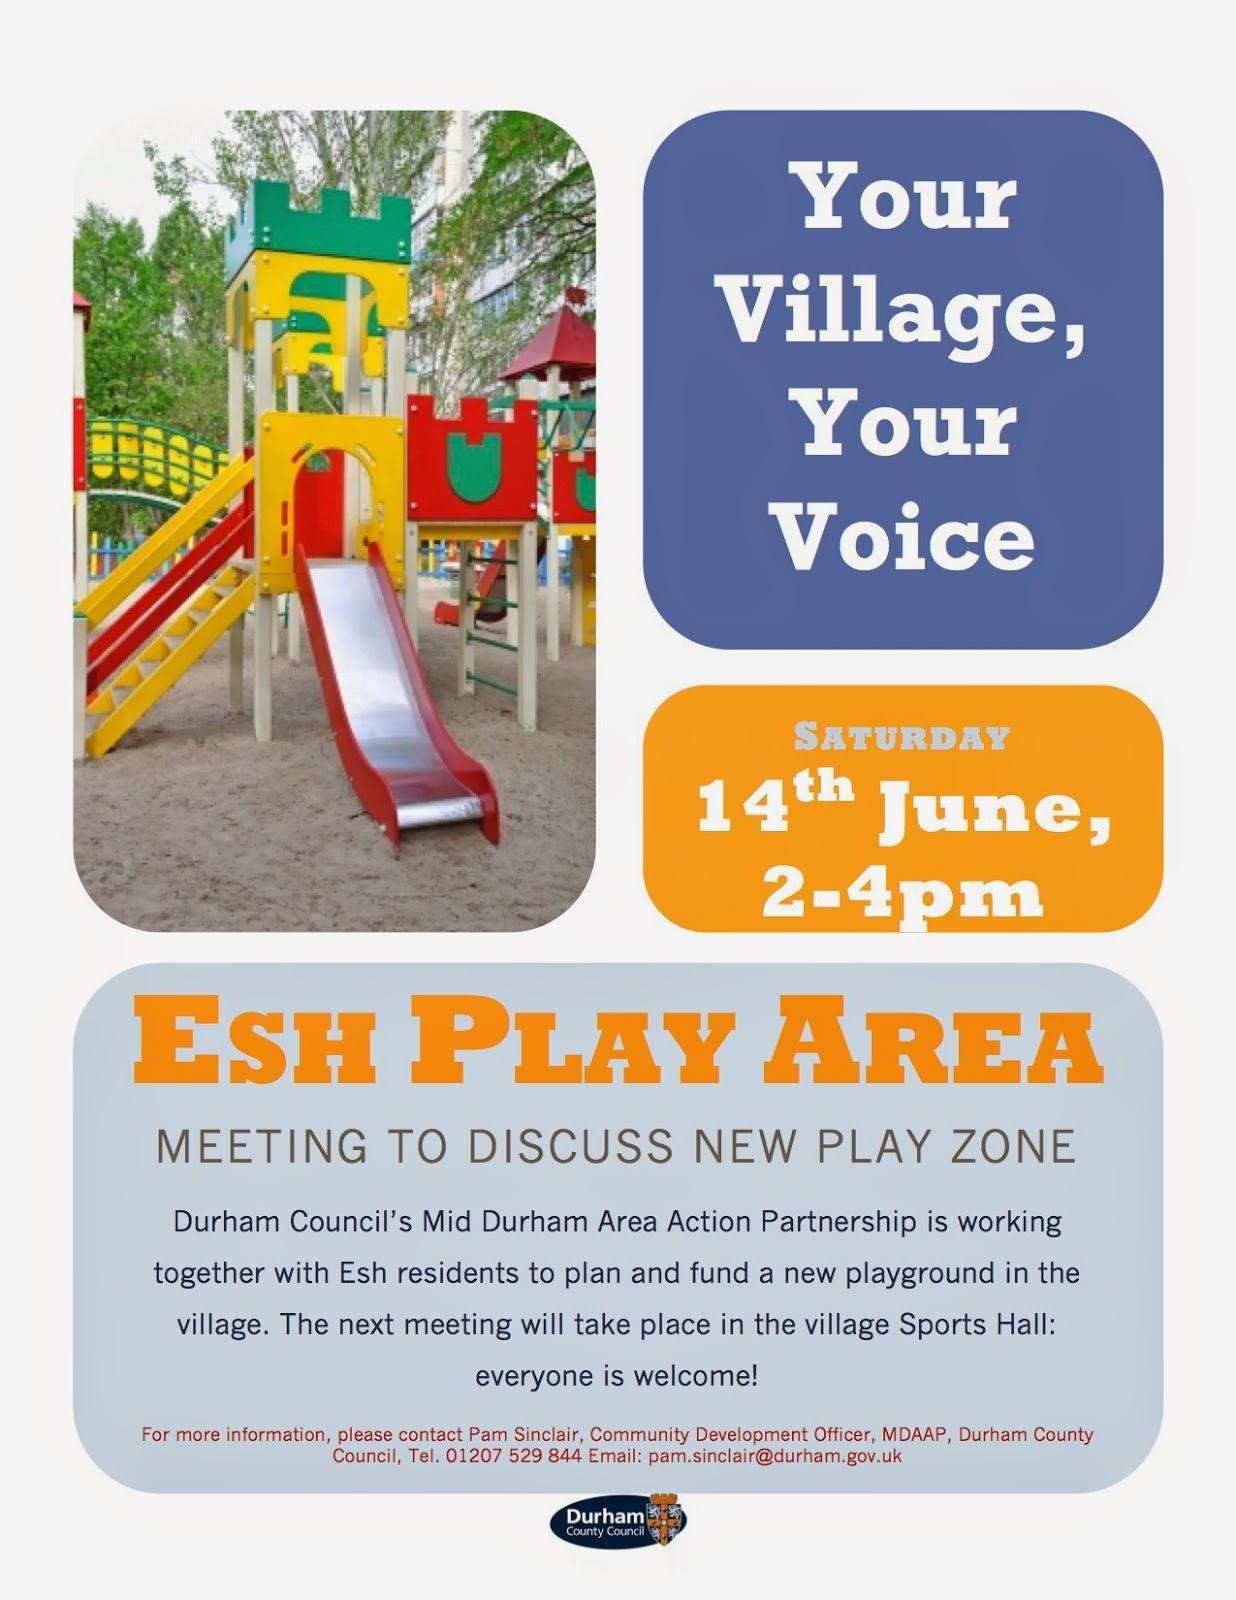 Esh Village, County Durham: Esh Play Area: Project Meeting on